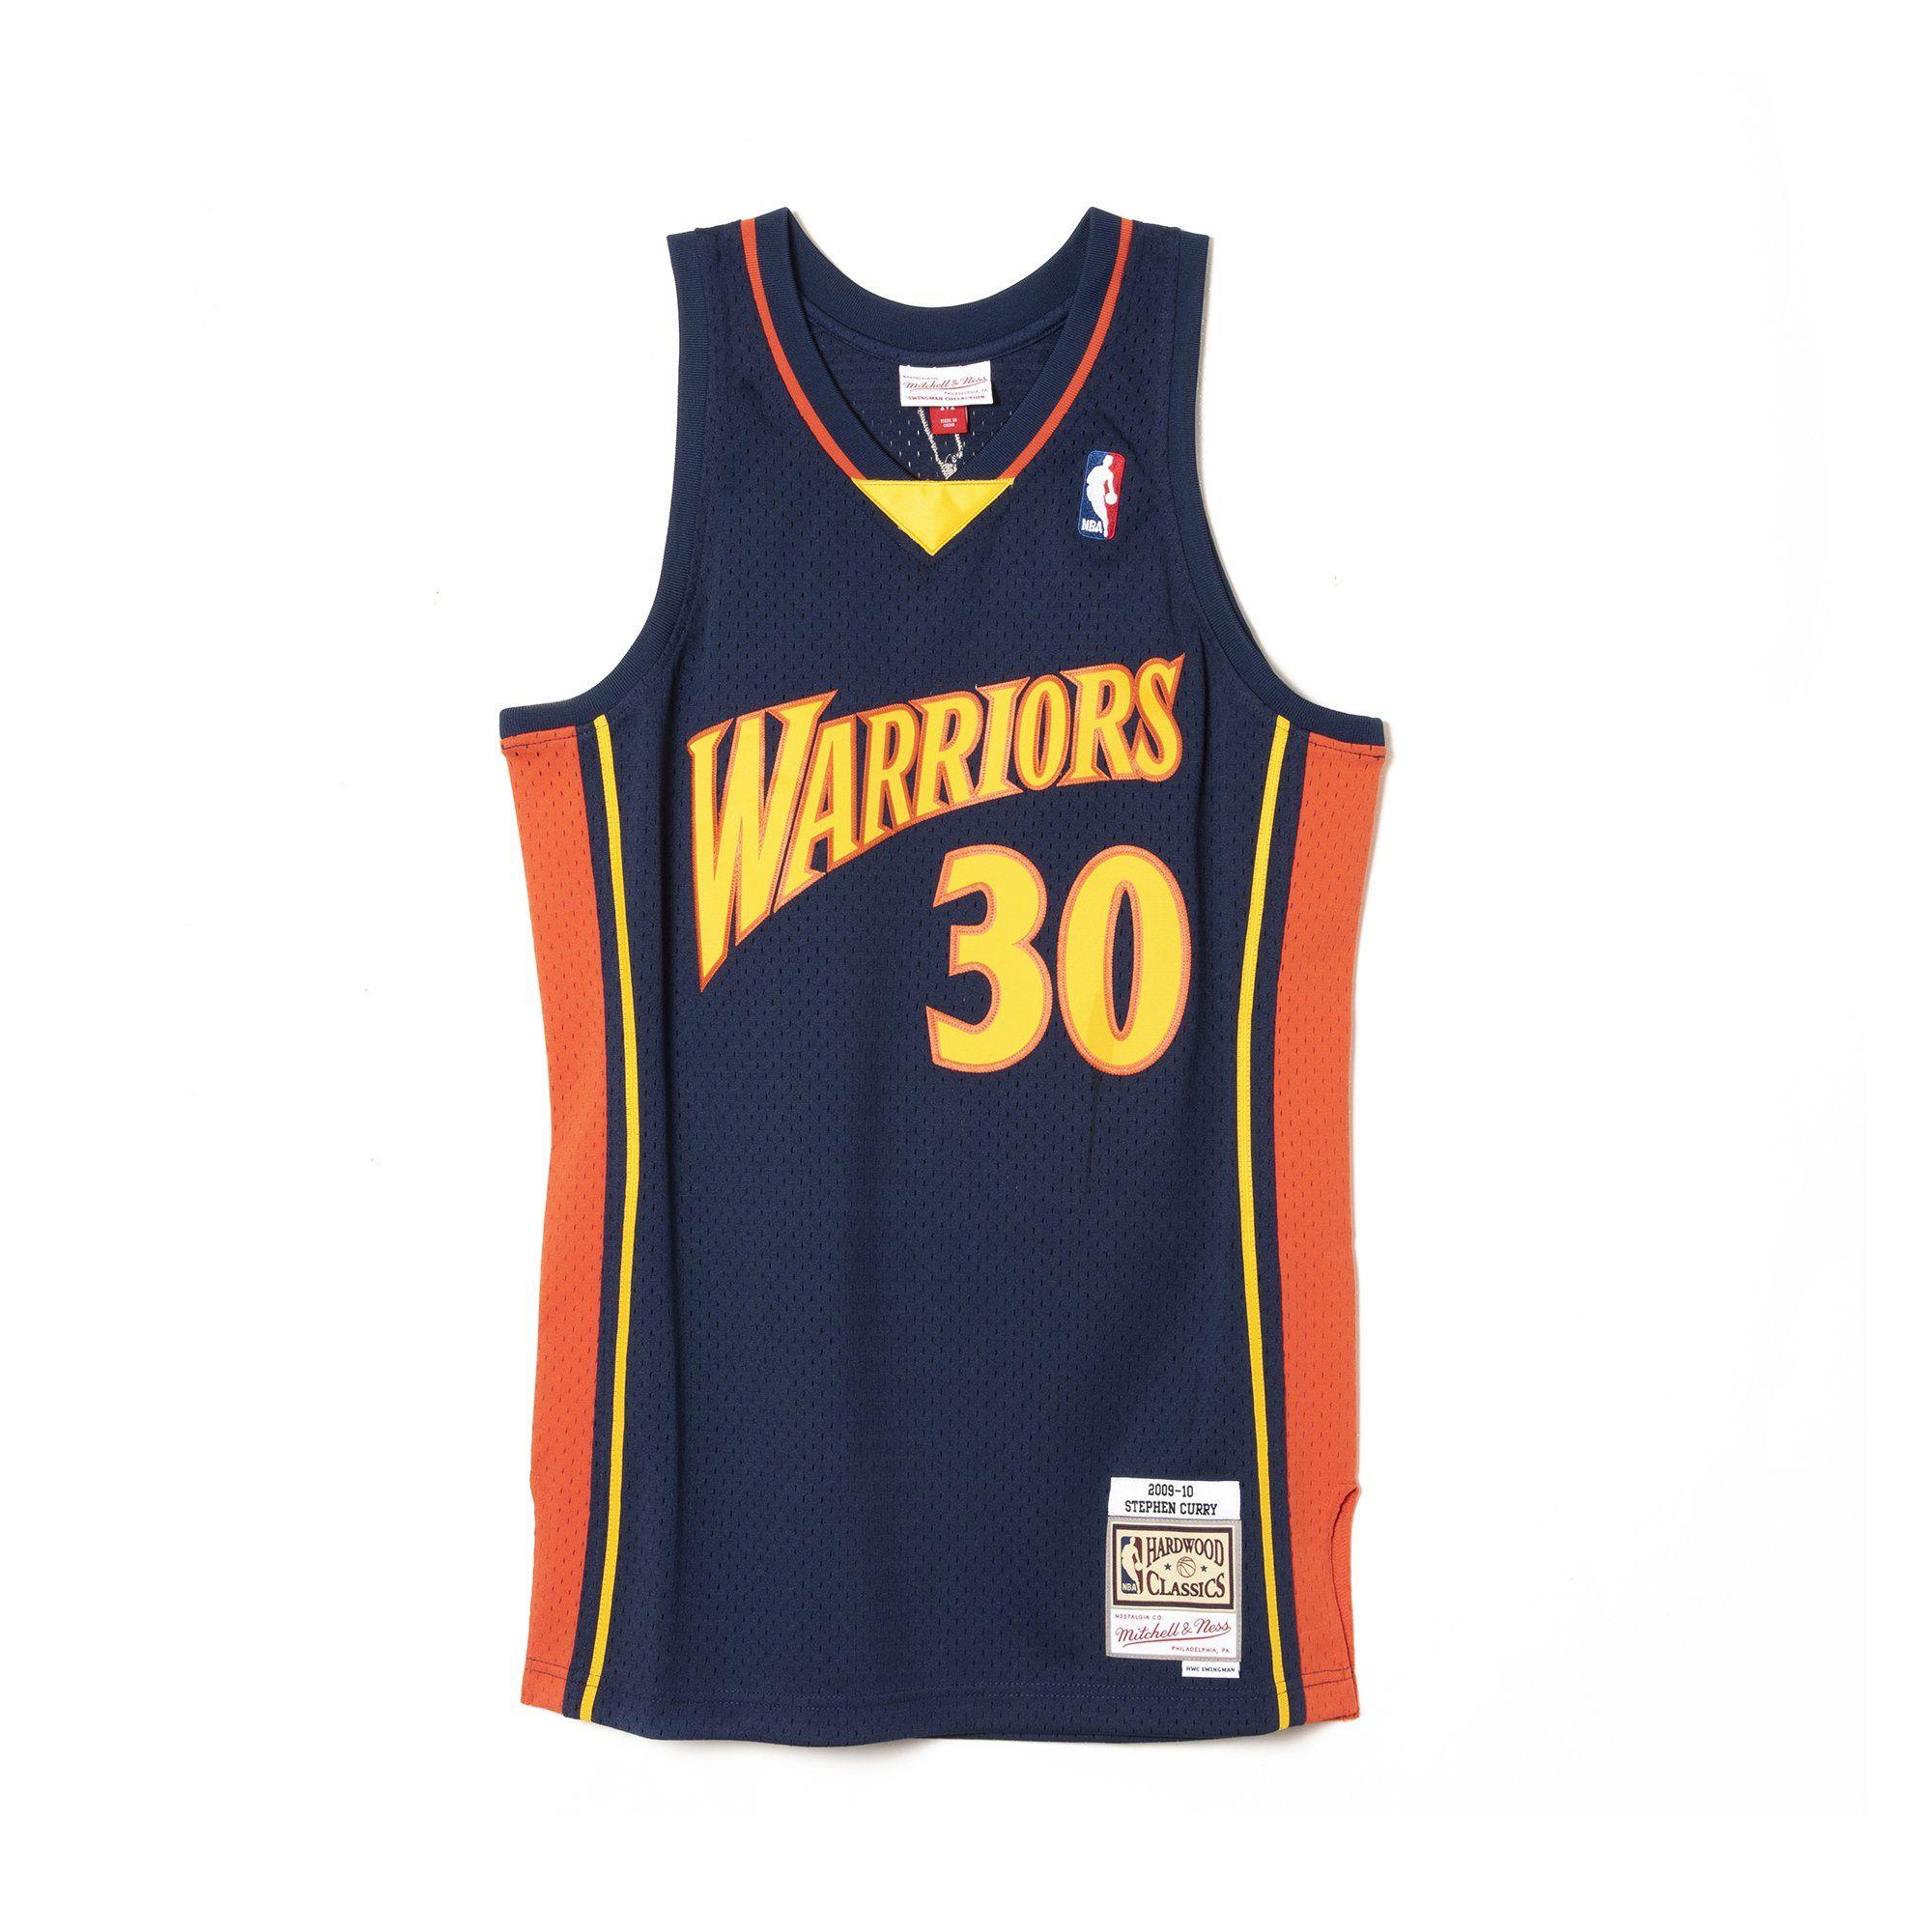 MN41JT46 / Mitchell & Ness /ミッチェル&ネス /ステフィンカリー / Stephen Curry /ユニフォーム/ ゴールデンステートウォリアーズ / Golden State Warriors